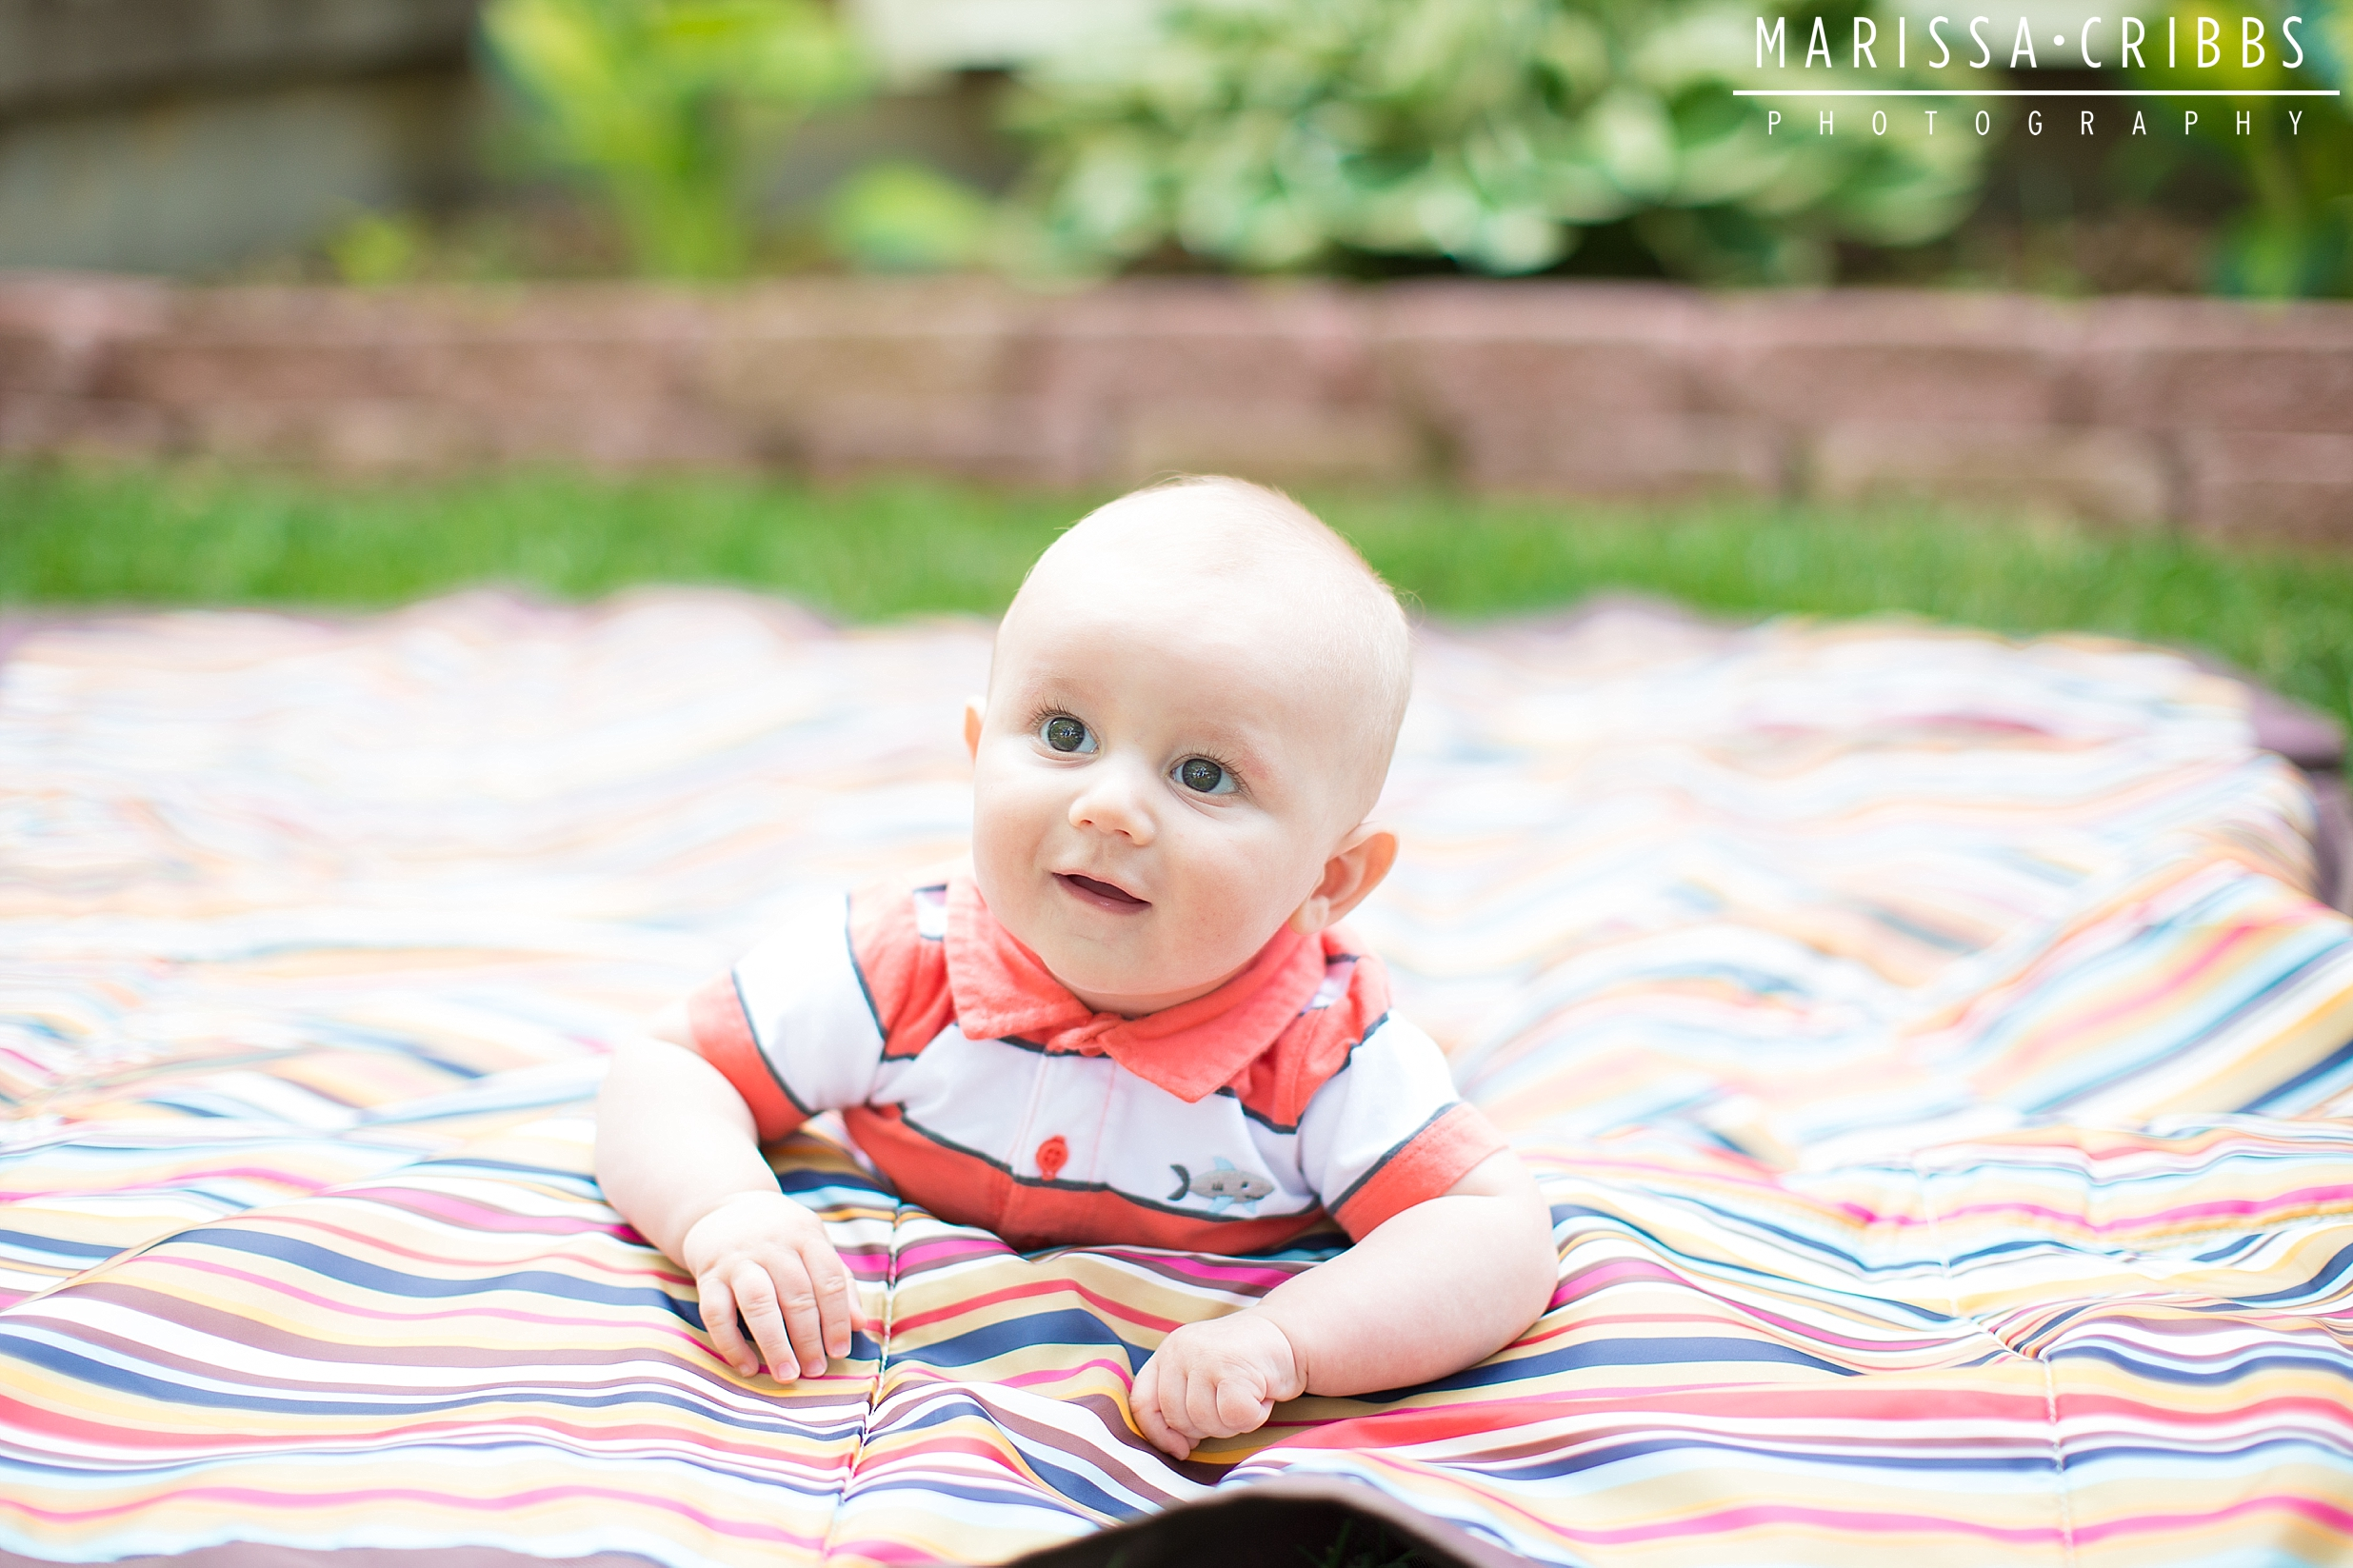 Kansas City Baby Photographer | Marissa Cribbs Photography